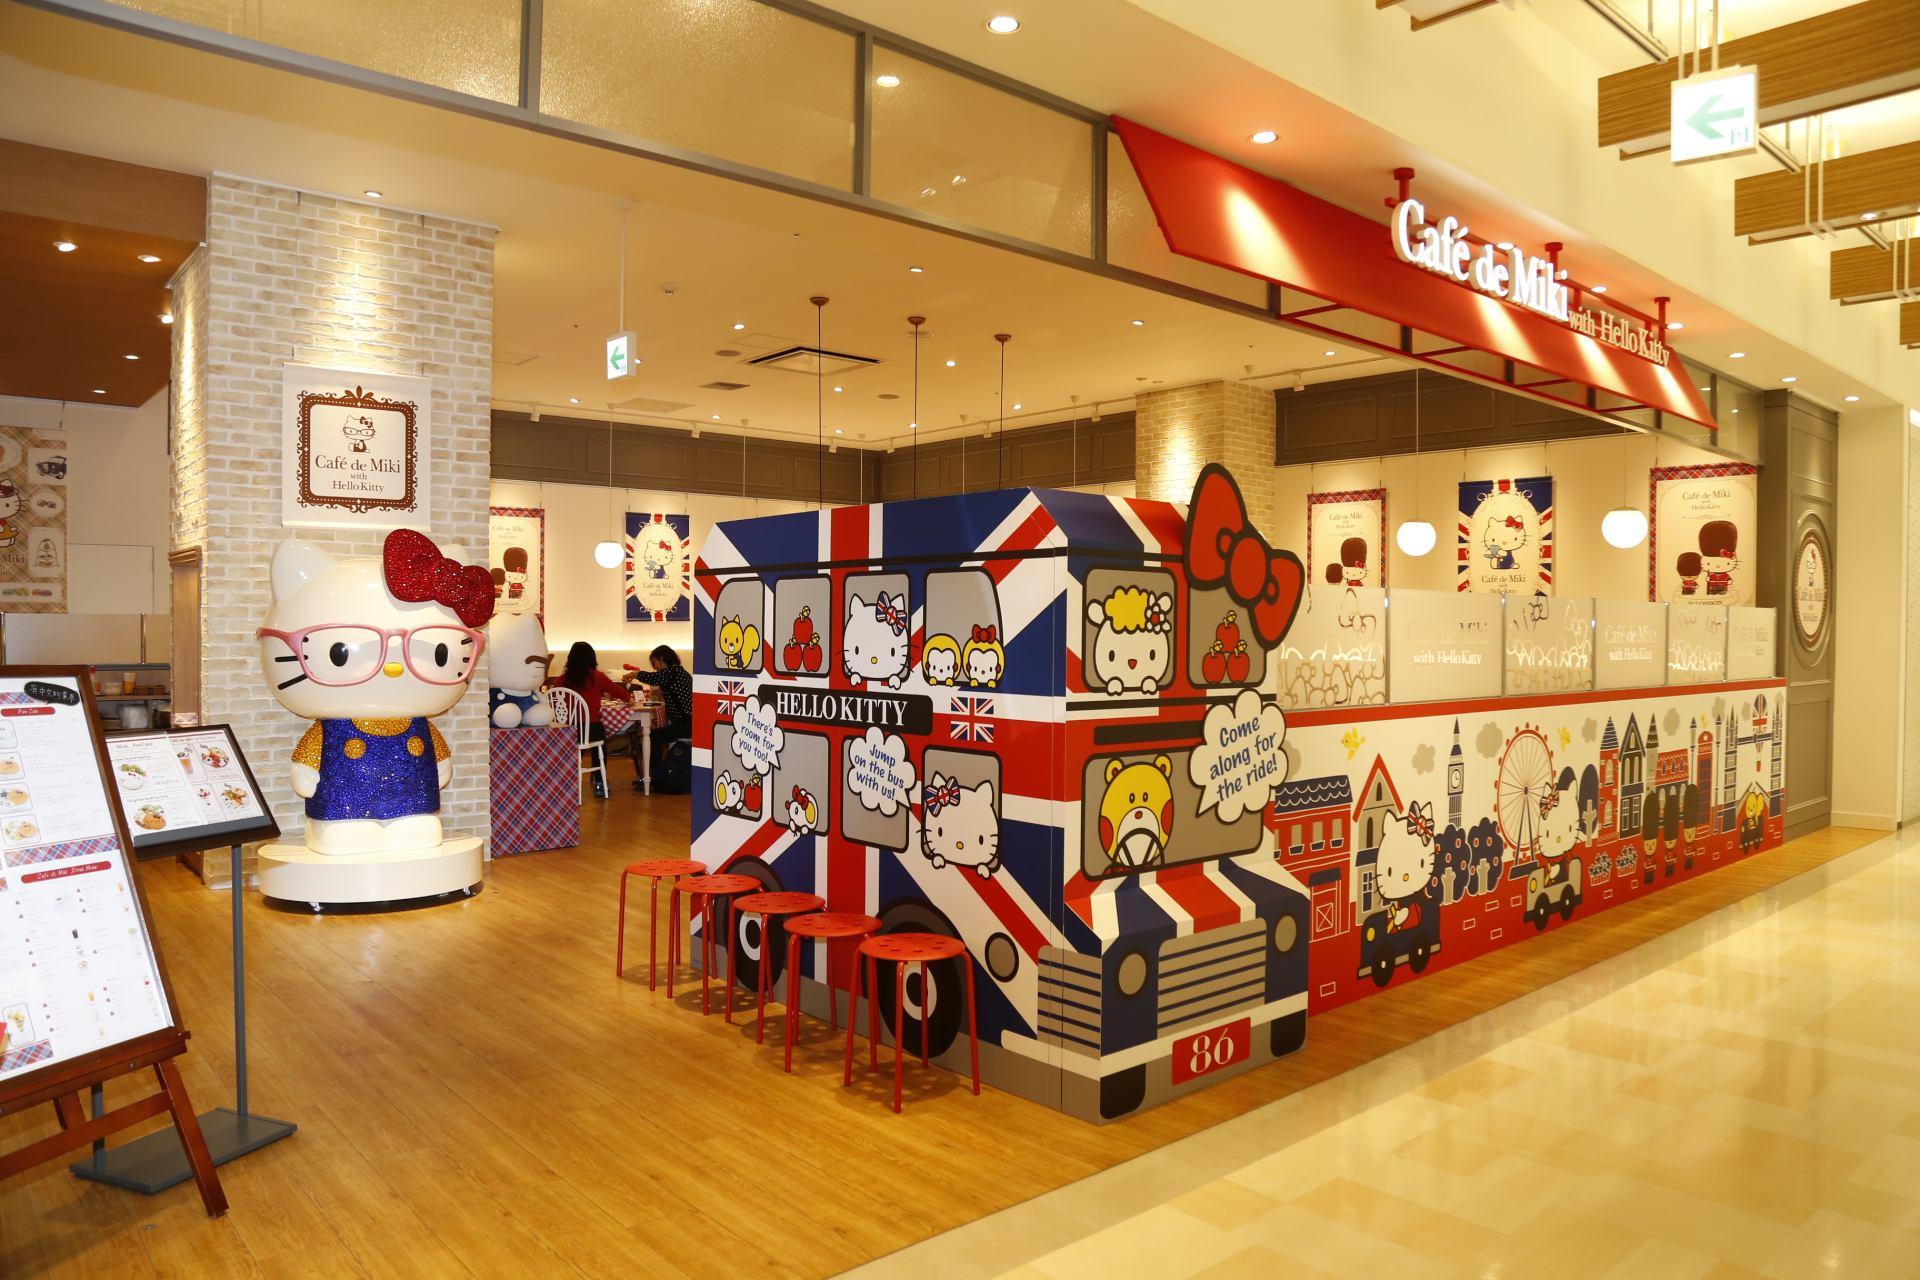 咖啡厅「Cafe de Miki with Hello Kitty」的外观